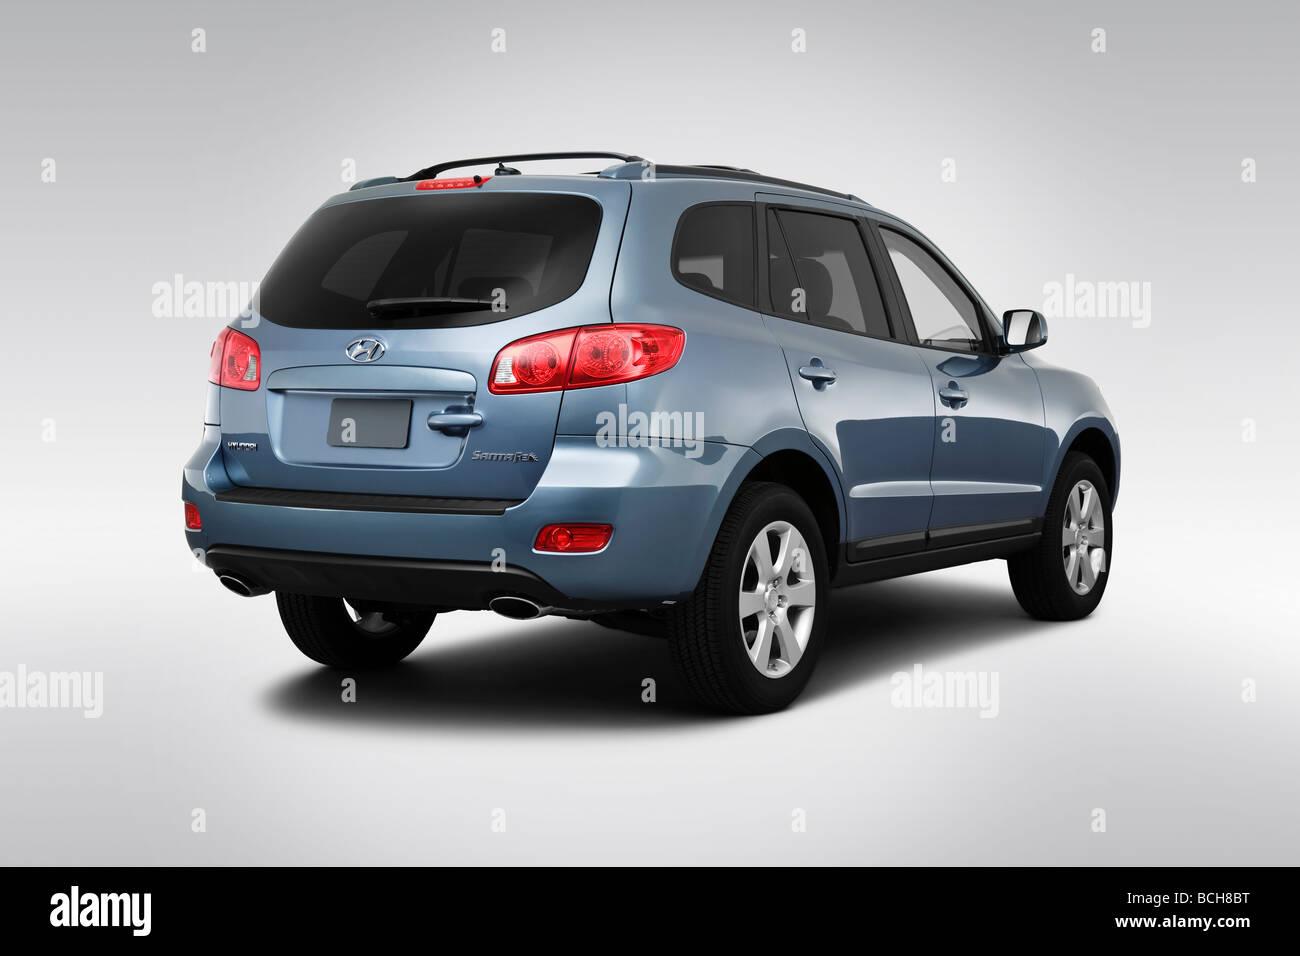 2009 Hyundai Santa Fe SE in Blue - Rear angle view - Stock Image